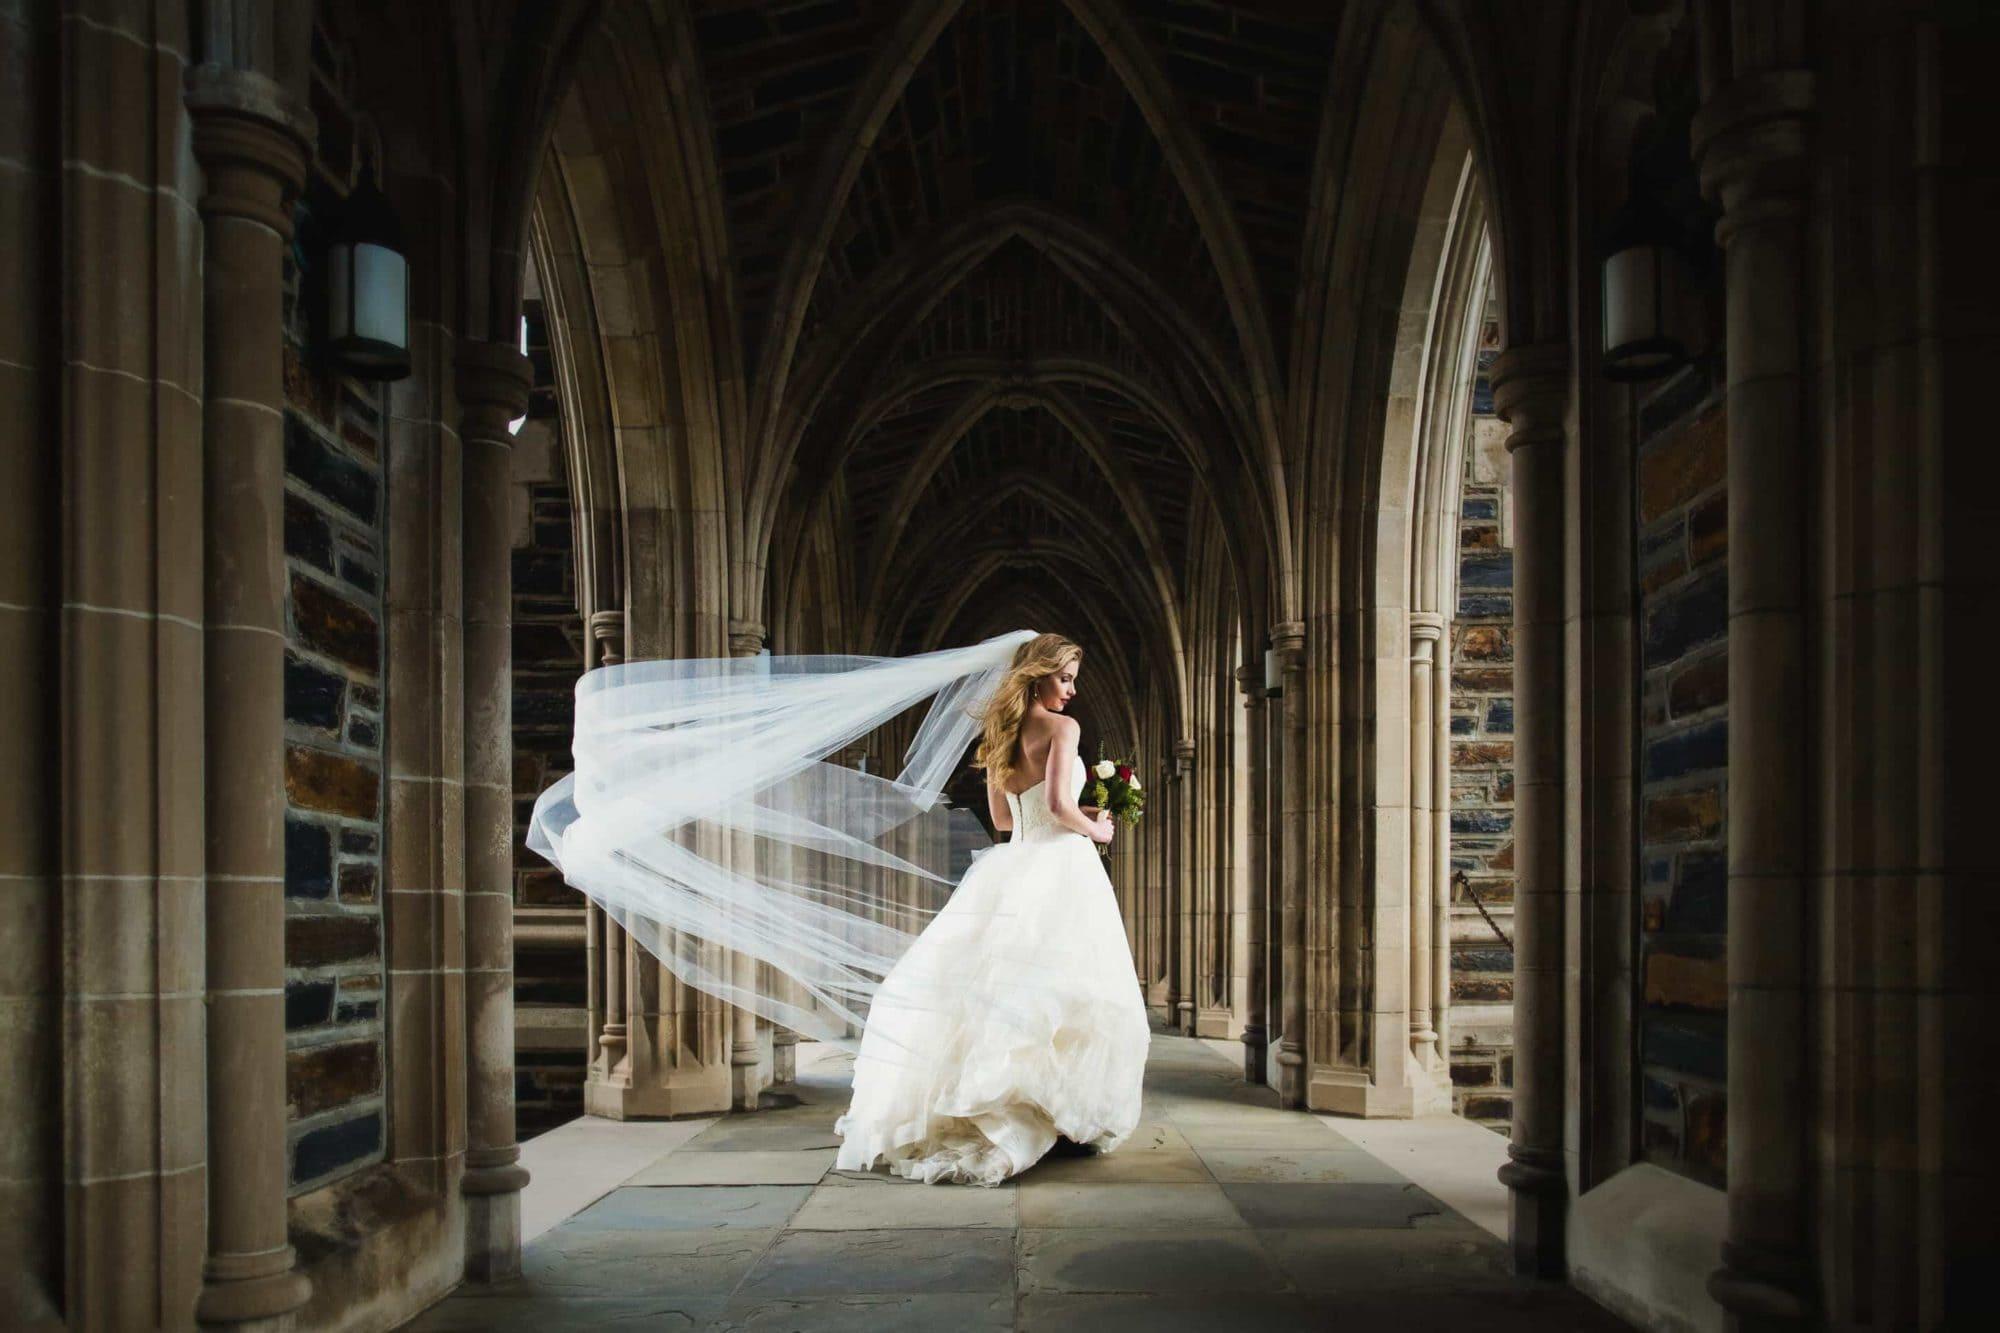 Duke-Chapel-Wedding-Photography-Bride-Arcades-1